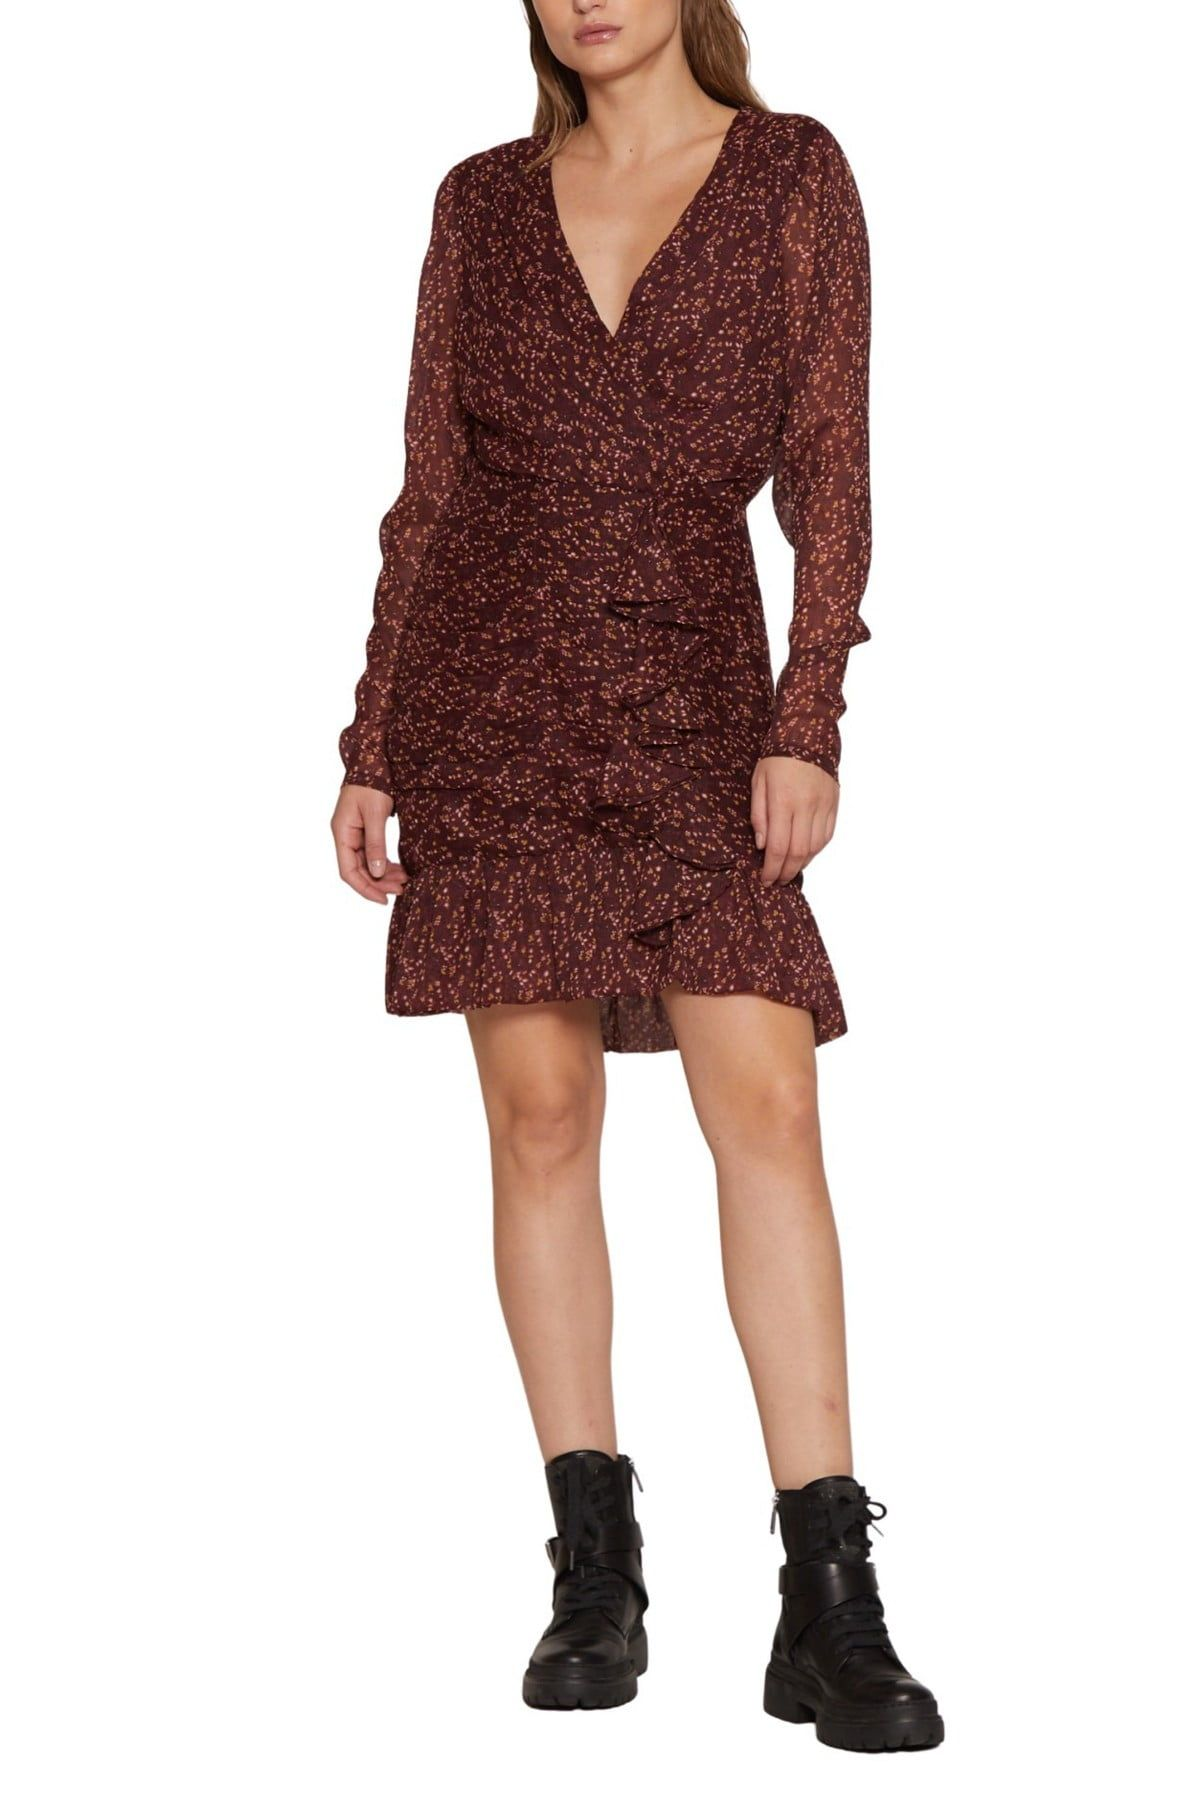 Walter Baker Tyrus Ruffled Long Sleeve Faux Wrap Dress Nordstrom Rack Wrap Dress Ruffle Long Sleeve Nordstrom Dresses [ 1800 x 1200 Pixel ]